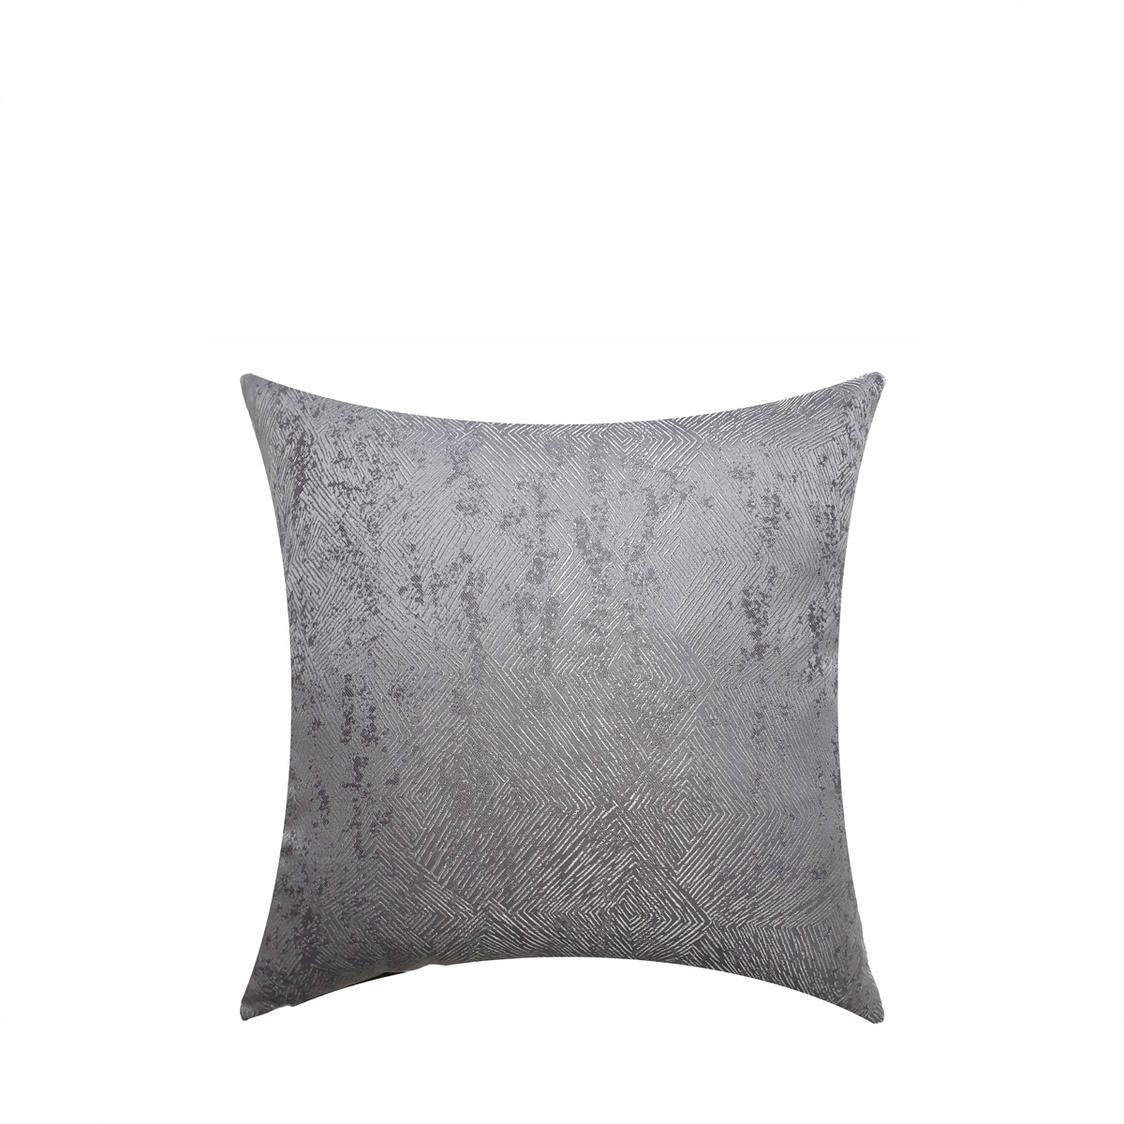 JRapee Ice Cushion Cover Grey 43x43cm